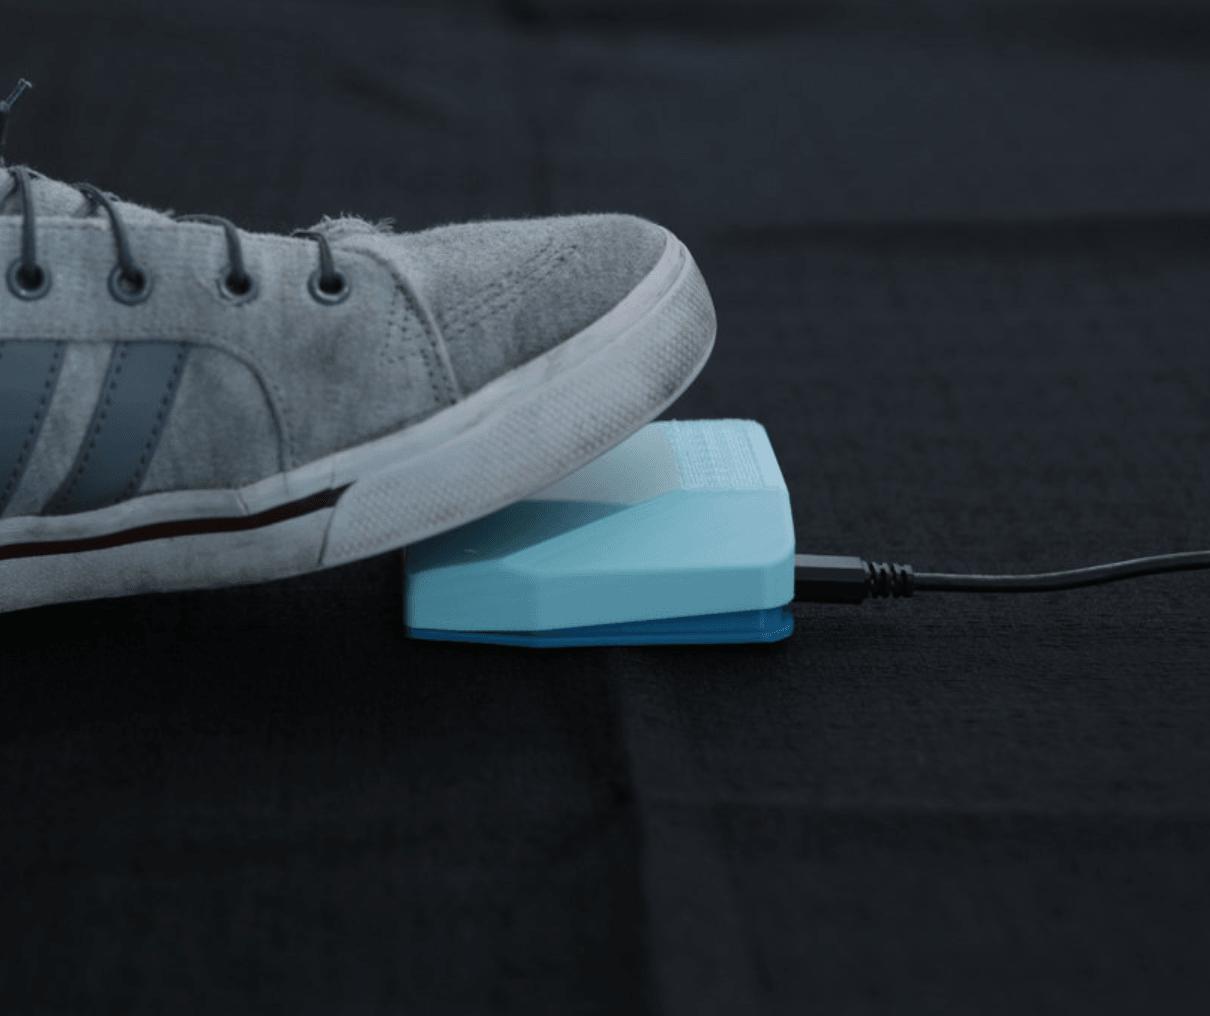 Capture d'écran 2018-03-21 à 11.04.26.png Download free STL file USB Foot Switch Controller • Model to 3D print, Adafruit